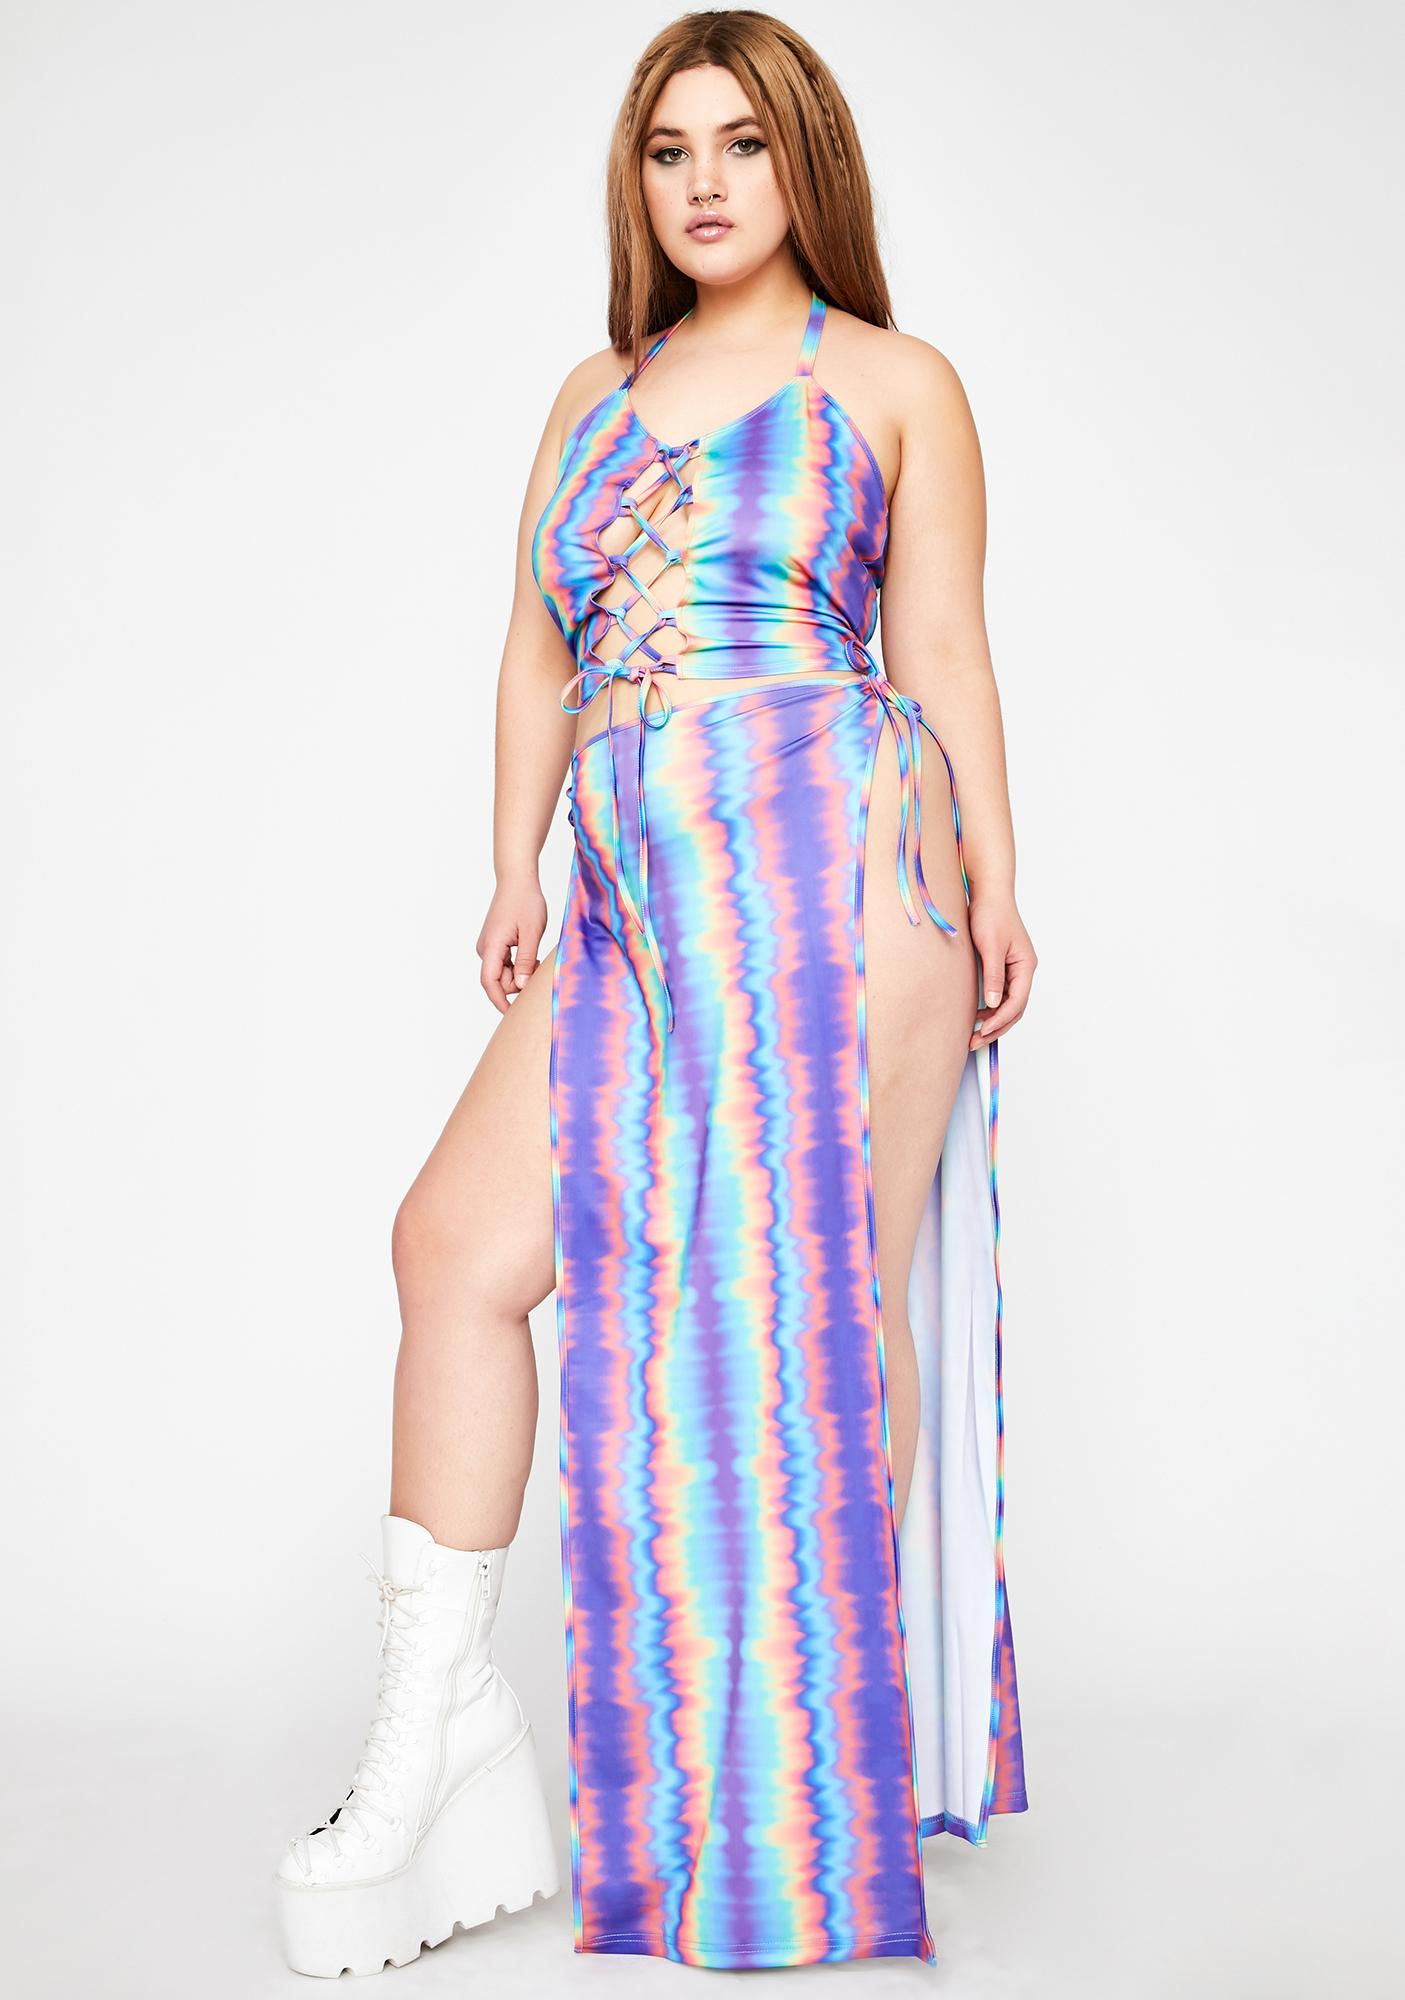 Club Exx Real Hypnotic Mist Lace-Up Maxi Set